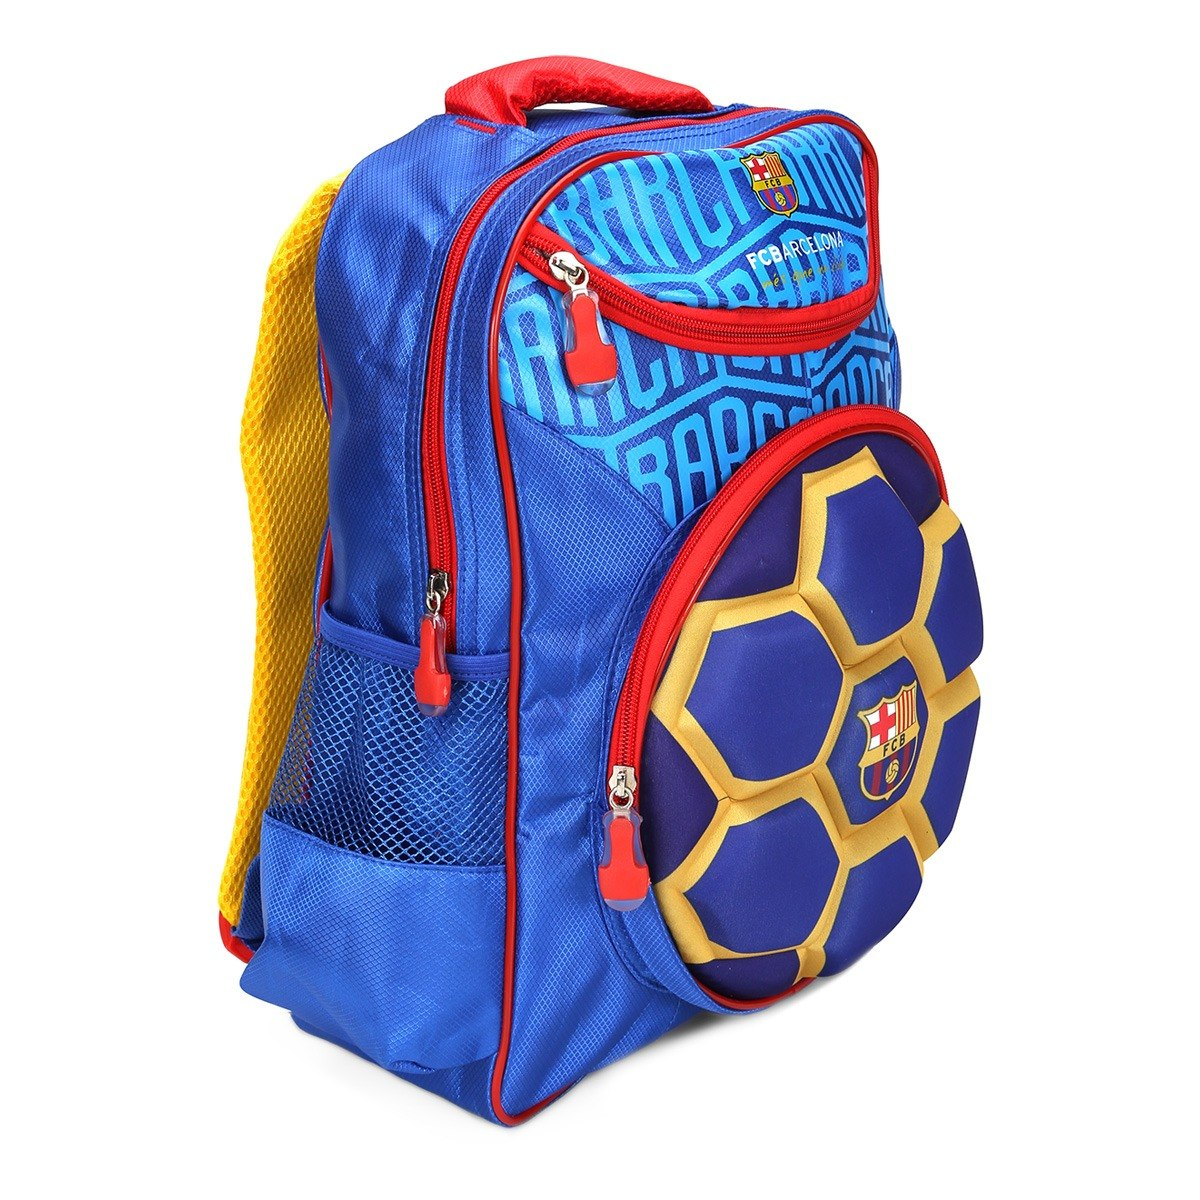 876d4c461 mochila escolar infantil barcelona bola 3d time de futebol. Carregando zoom.